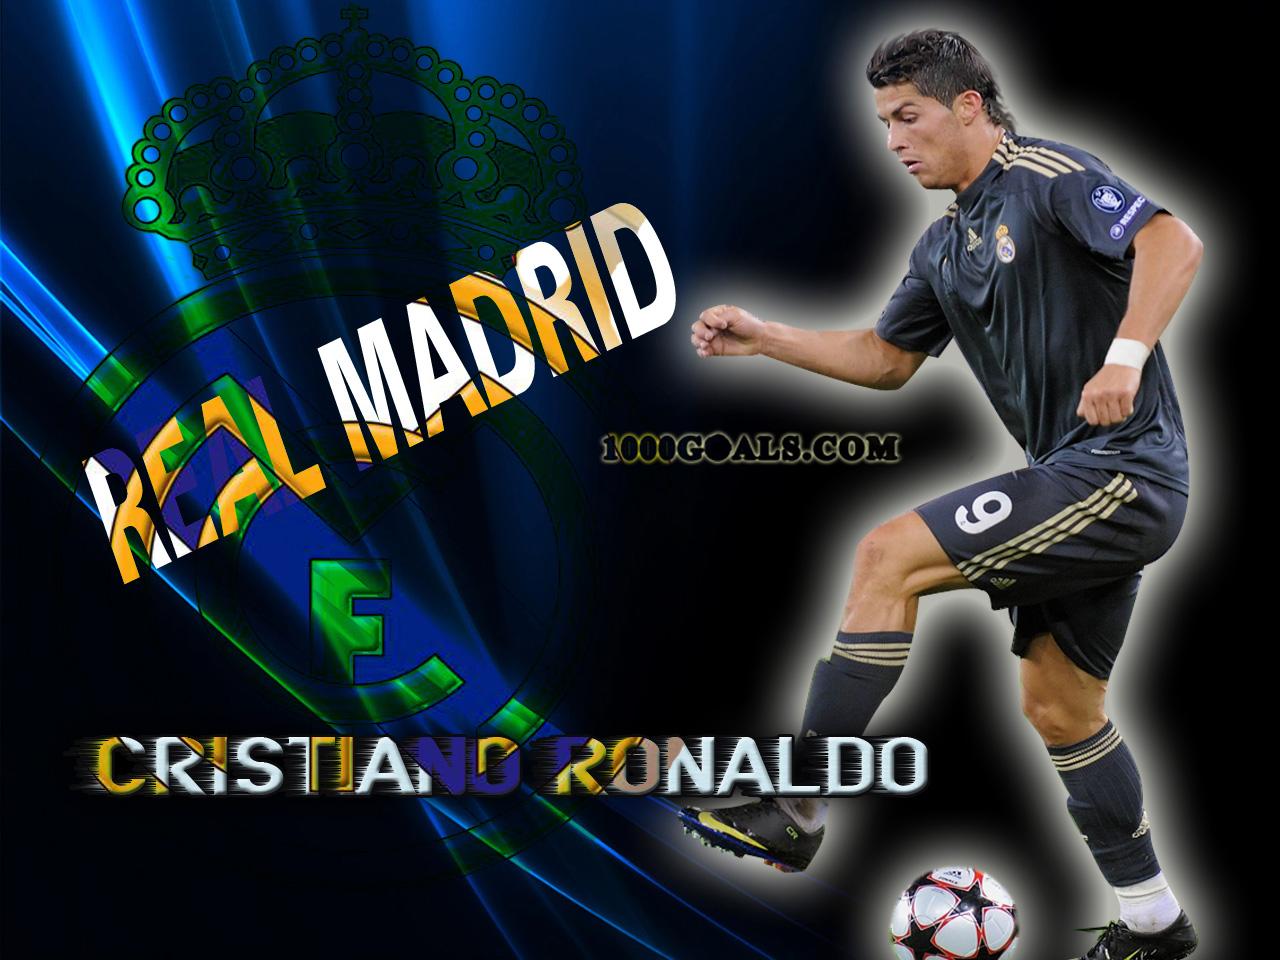 http://4.bp.blogspot.com/-tX-Zos5bXQ8/T5_pEB0uT0I/AAAAAAAADPM/bu_7tNTod9g/s1600/Cristiano-Ronaldo-Real-Madrid-03.jpg